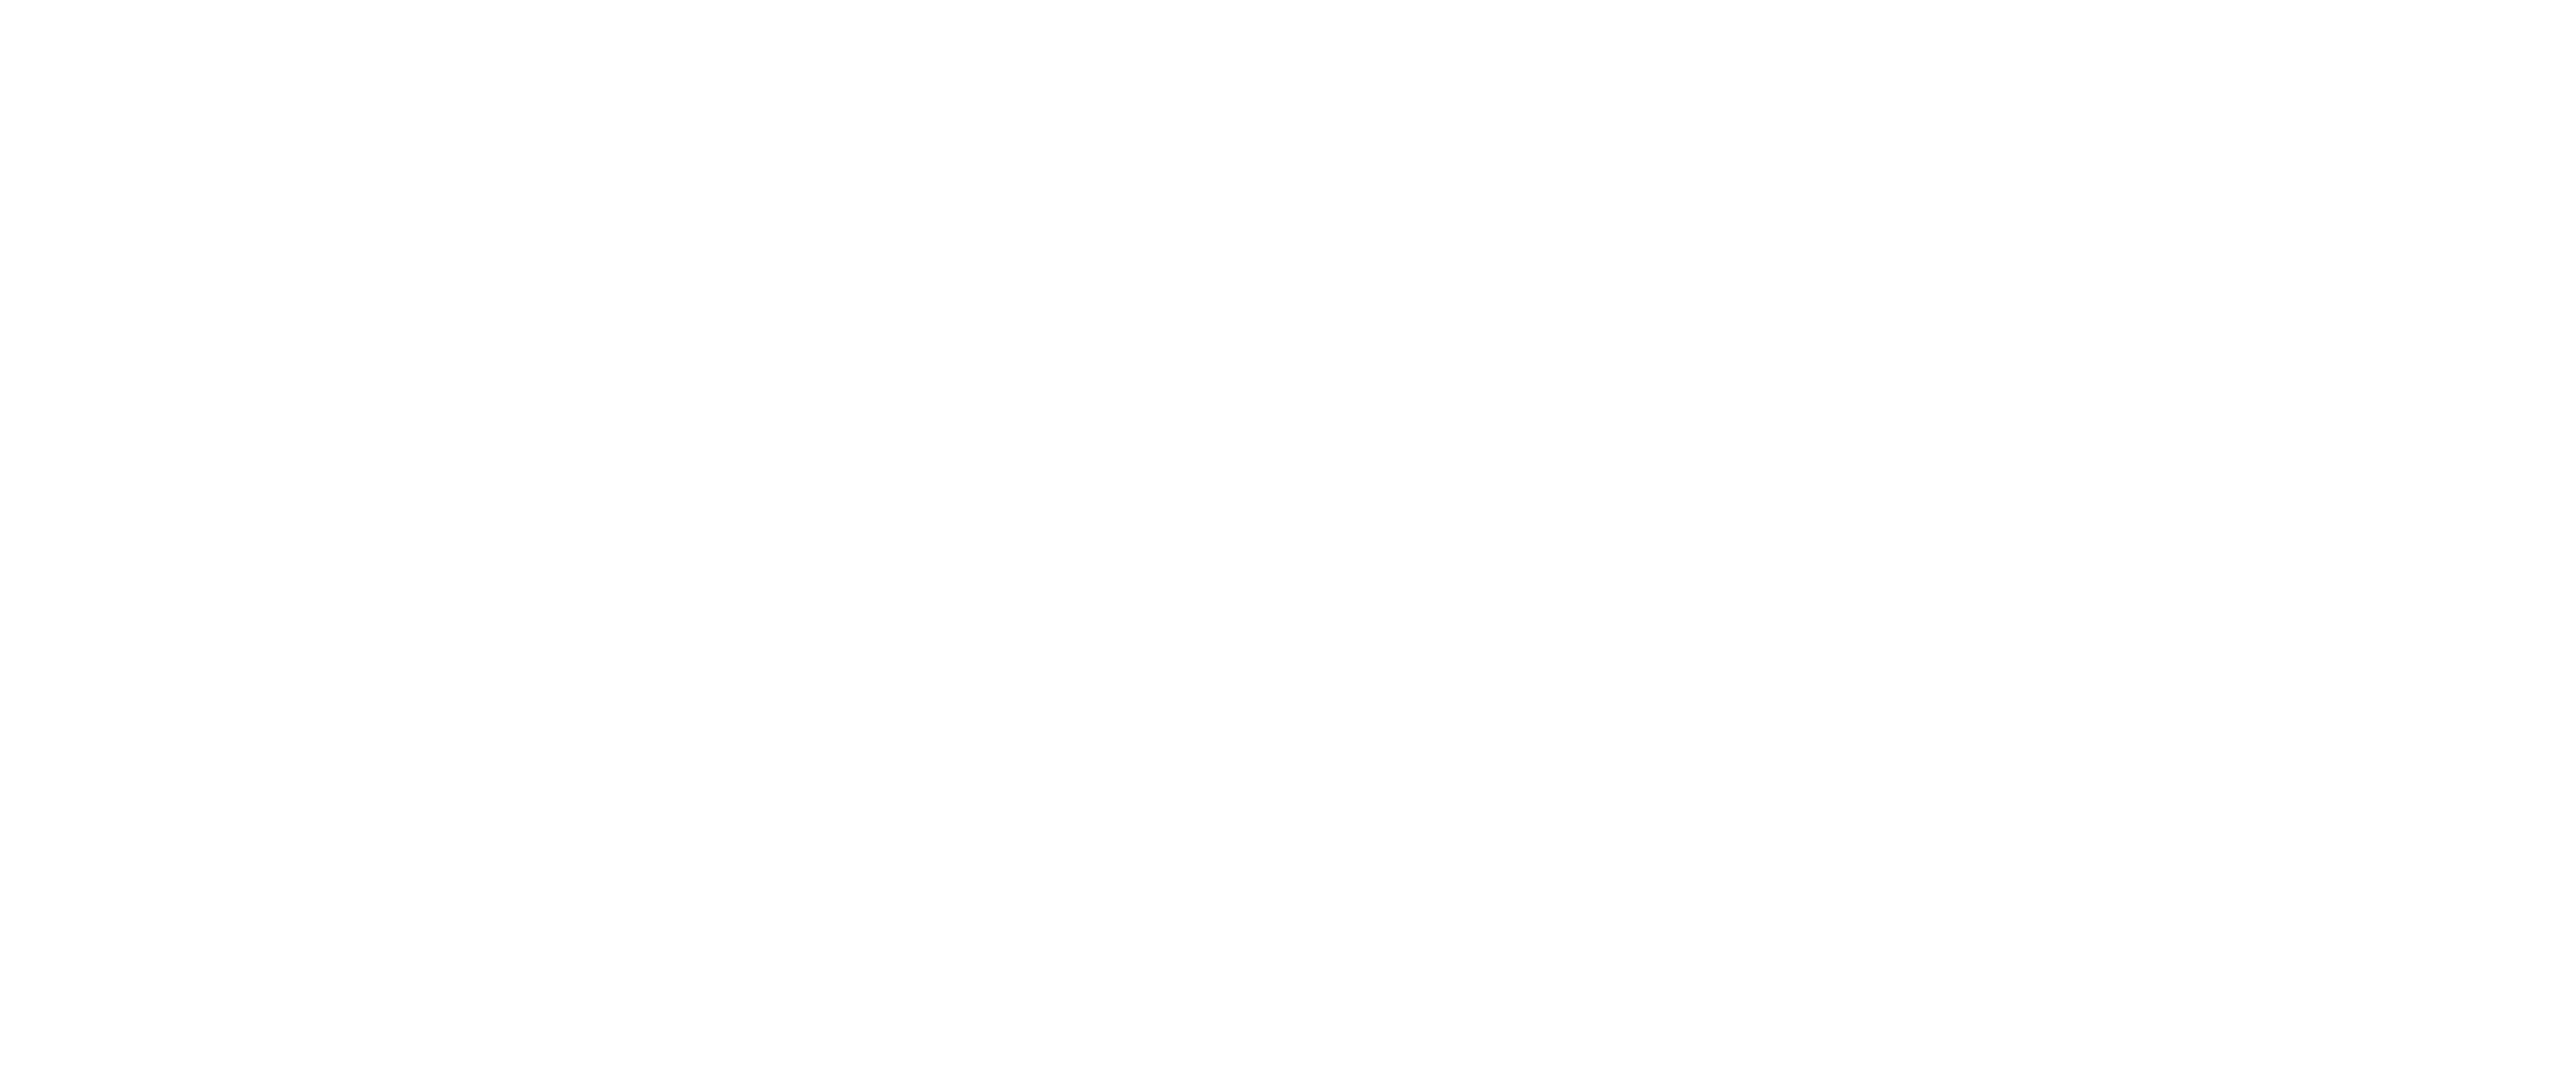 JESSICA CLARÈN